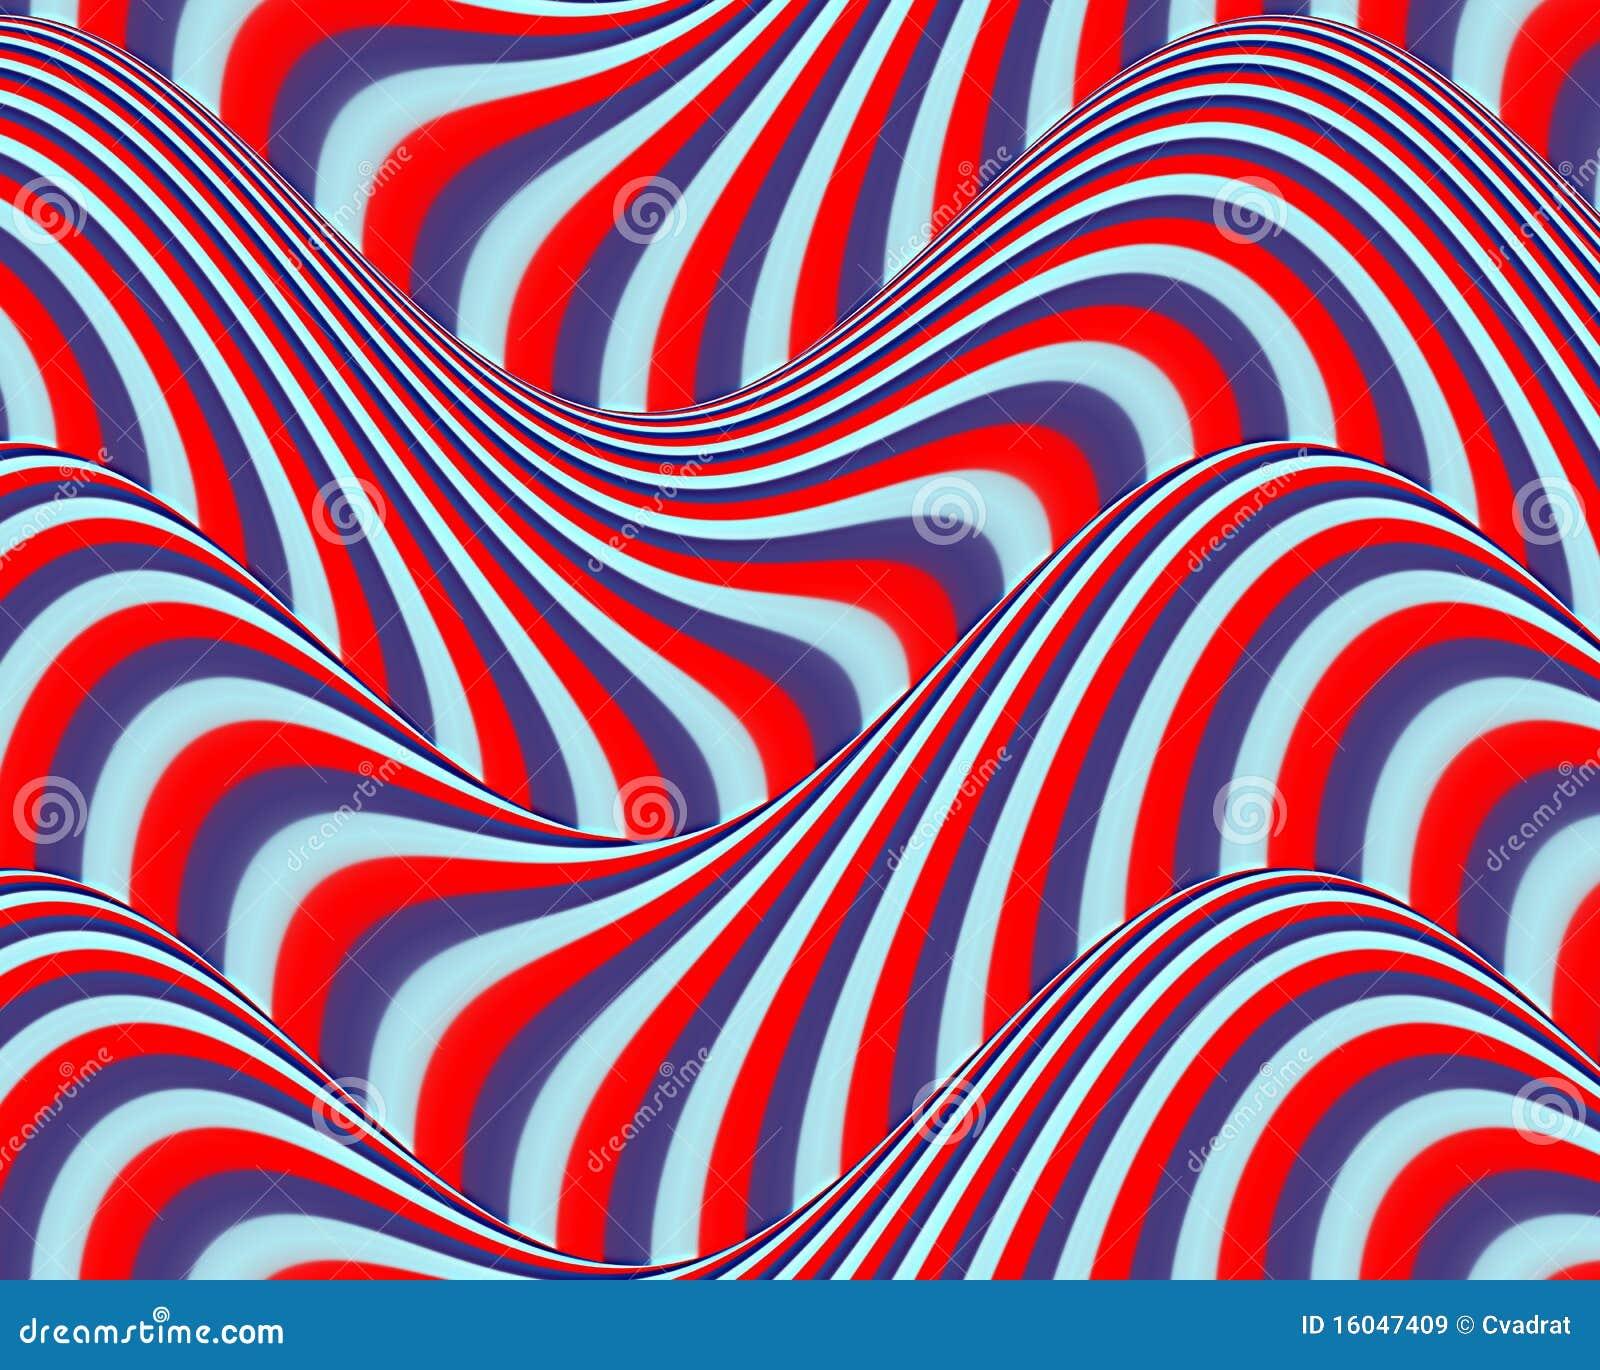 Op Art Flowing Stripes Red Blue Light Blue Stock